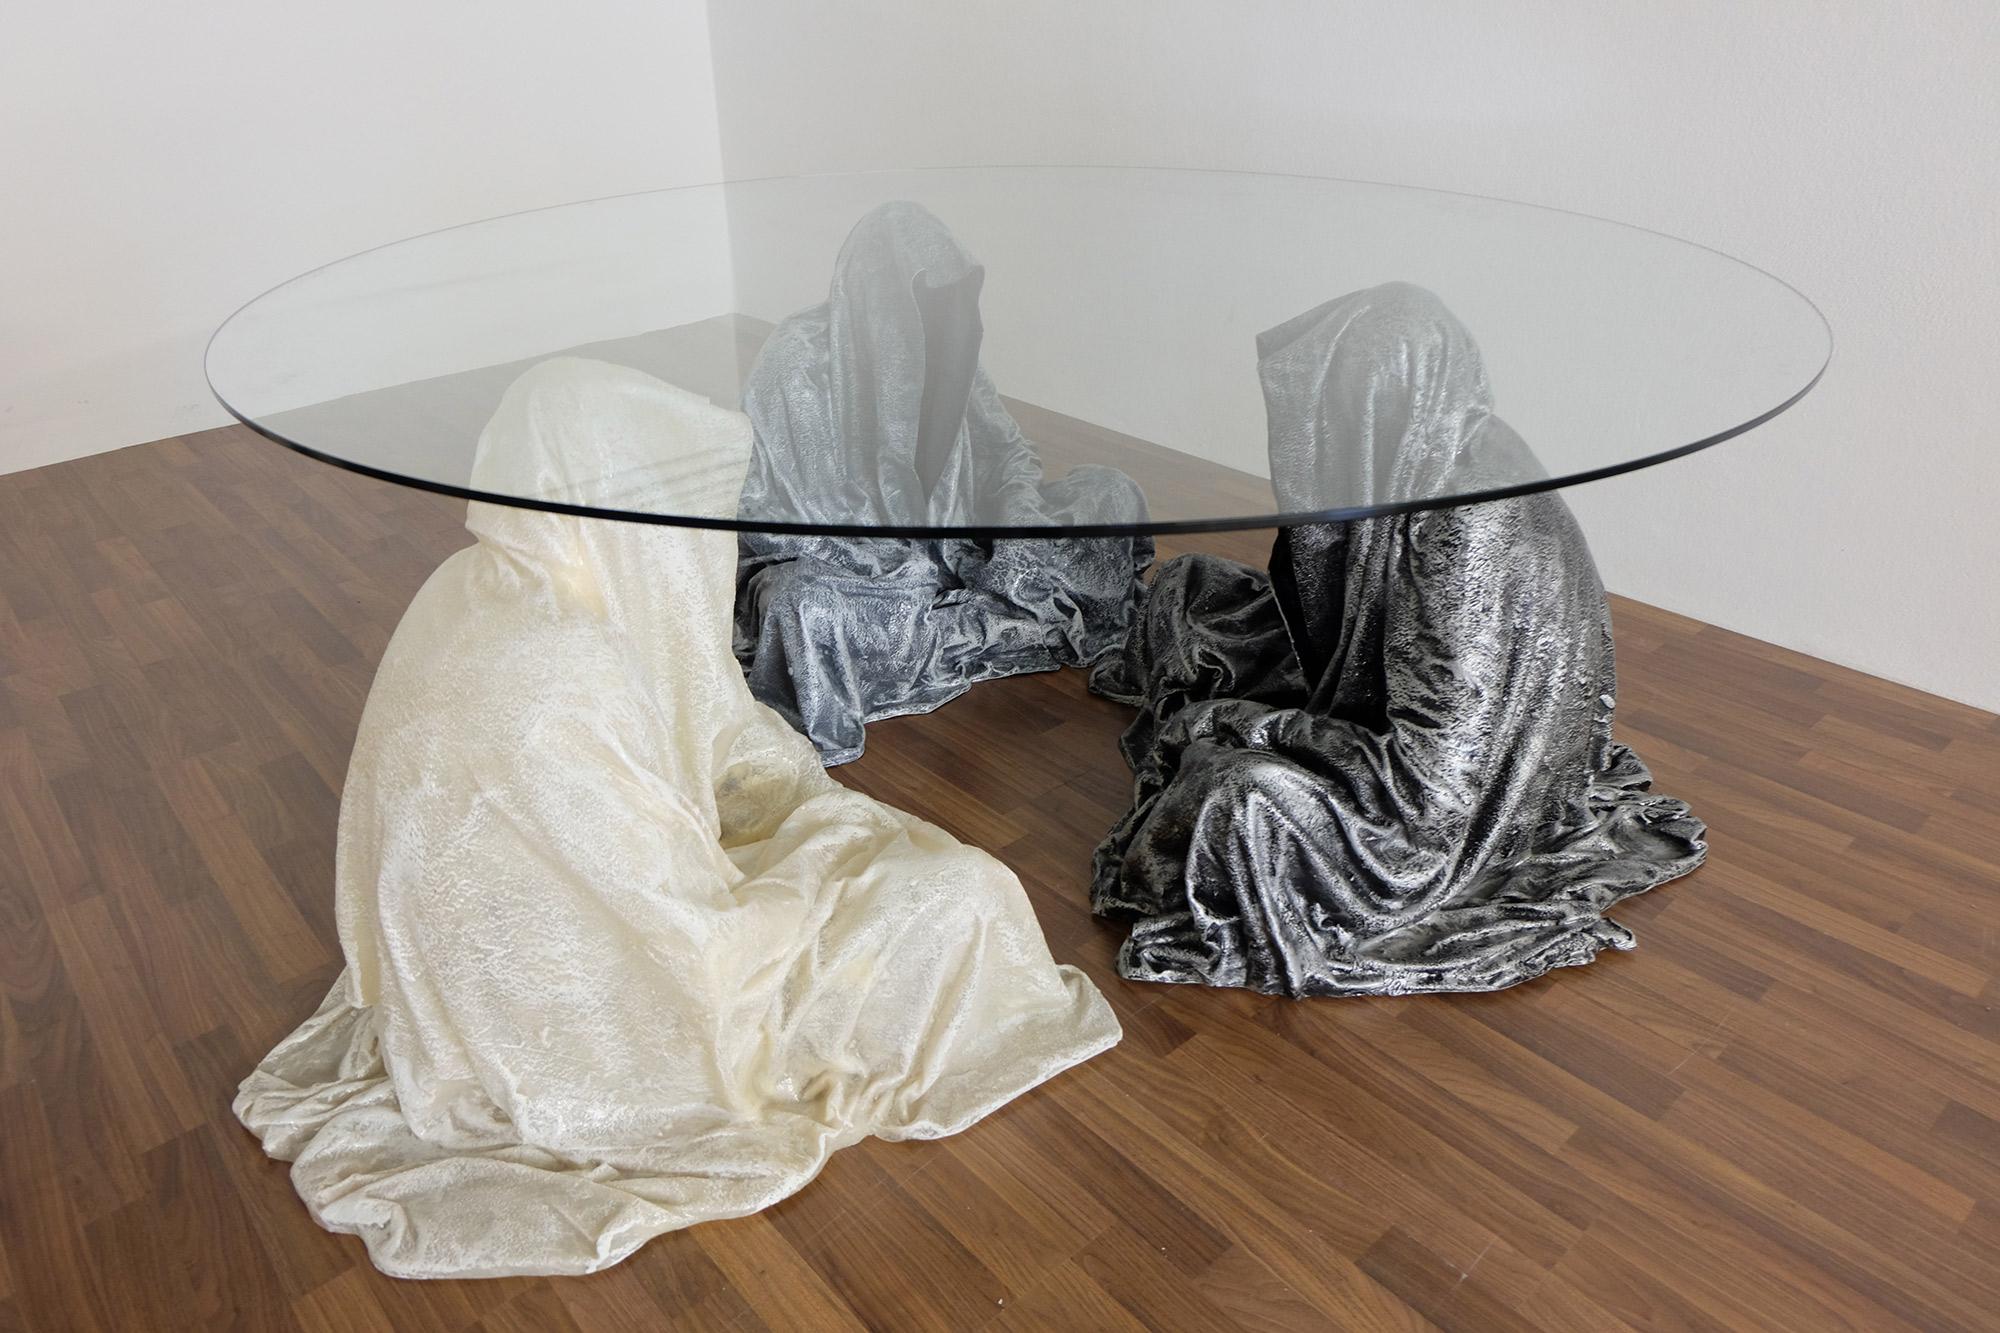 exclusive-furniture-guardian-table-glass-sculpture-statue-contemporary-light-art-design-antique-fine-art-manfred-kili-kielnhofer-4321y